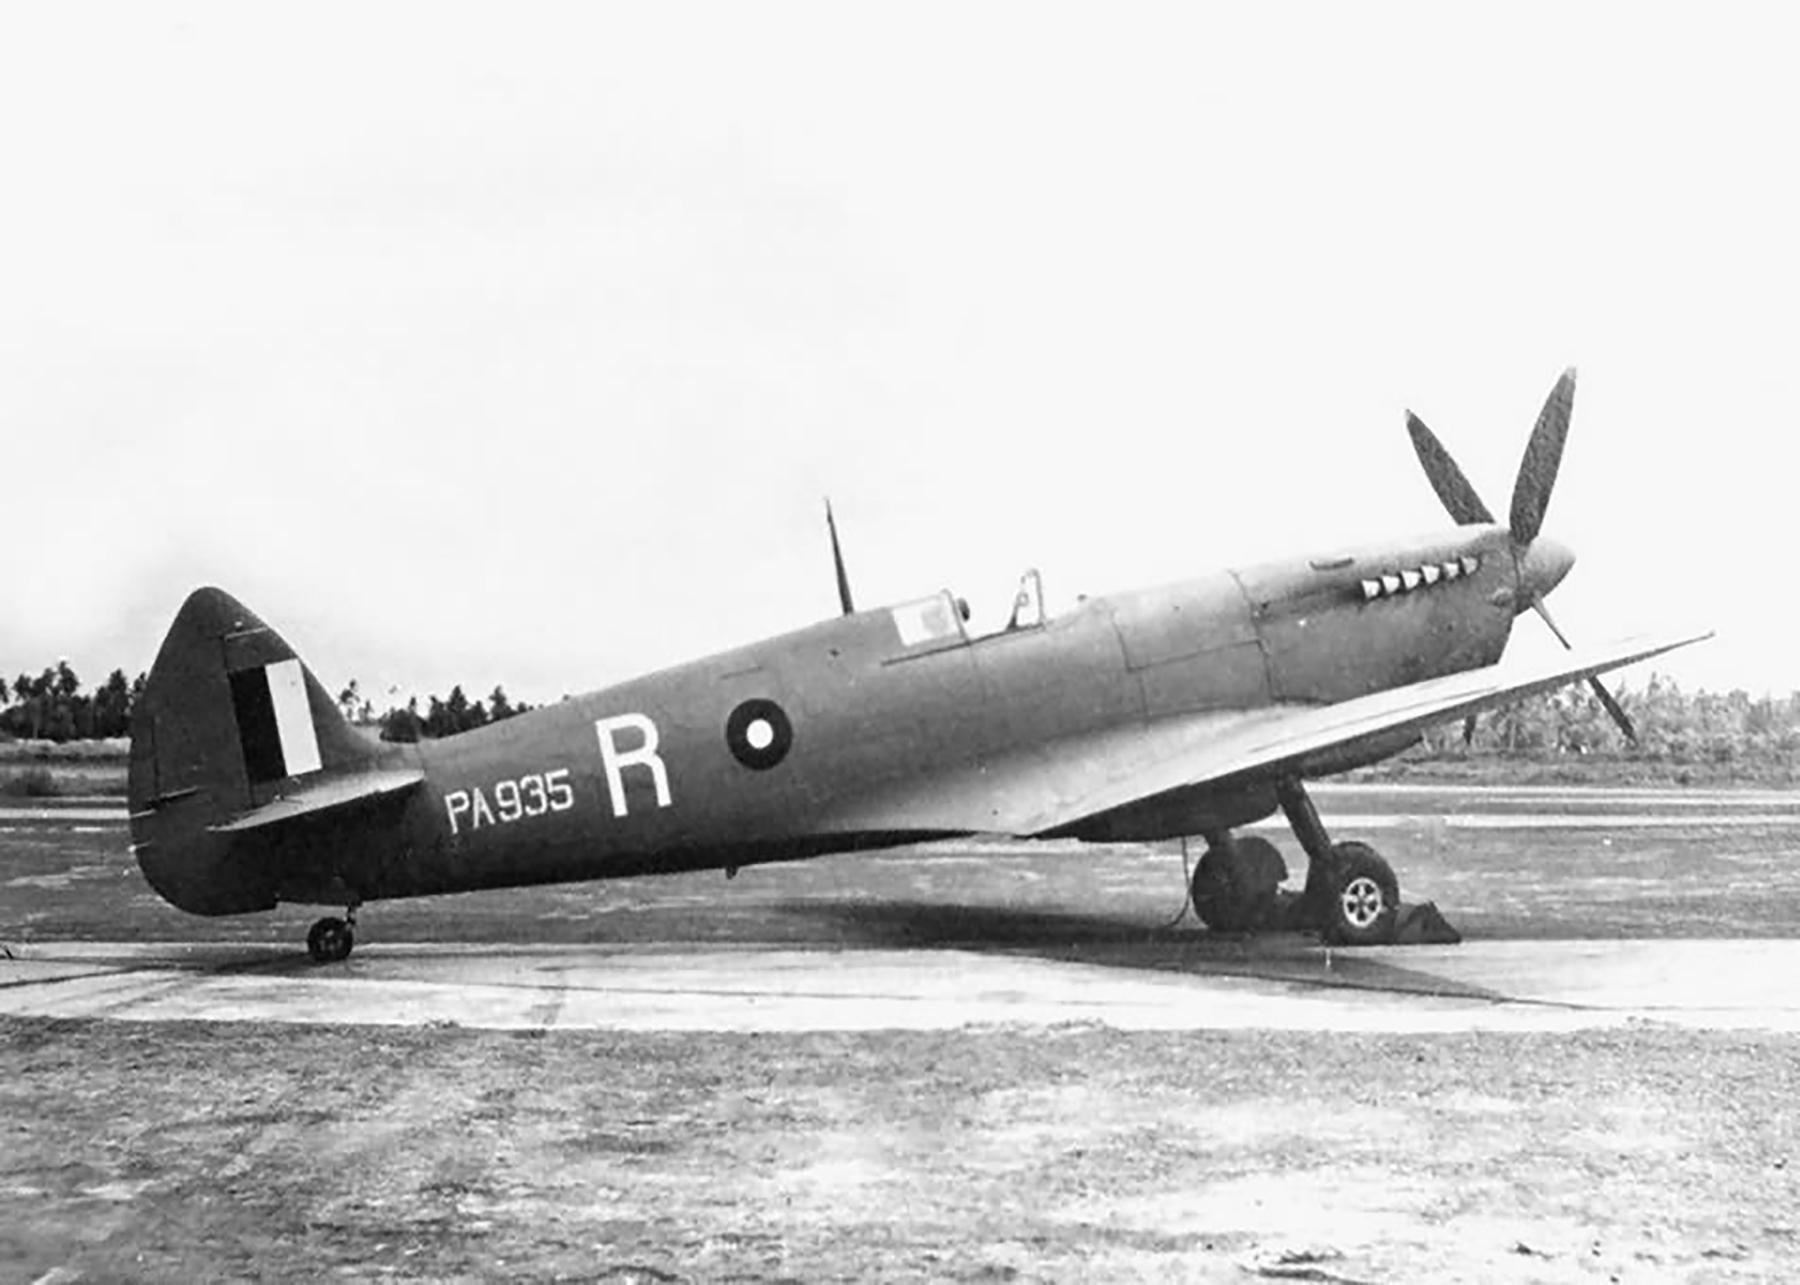 Recon Spitfires PRIX RAF ACSEA White R PA935 recon aircraft Mar 1944 web 01